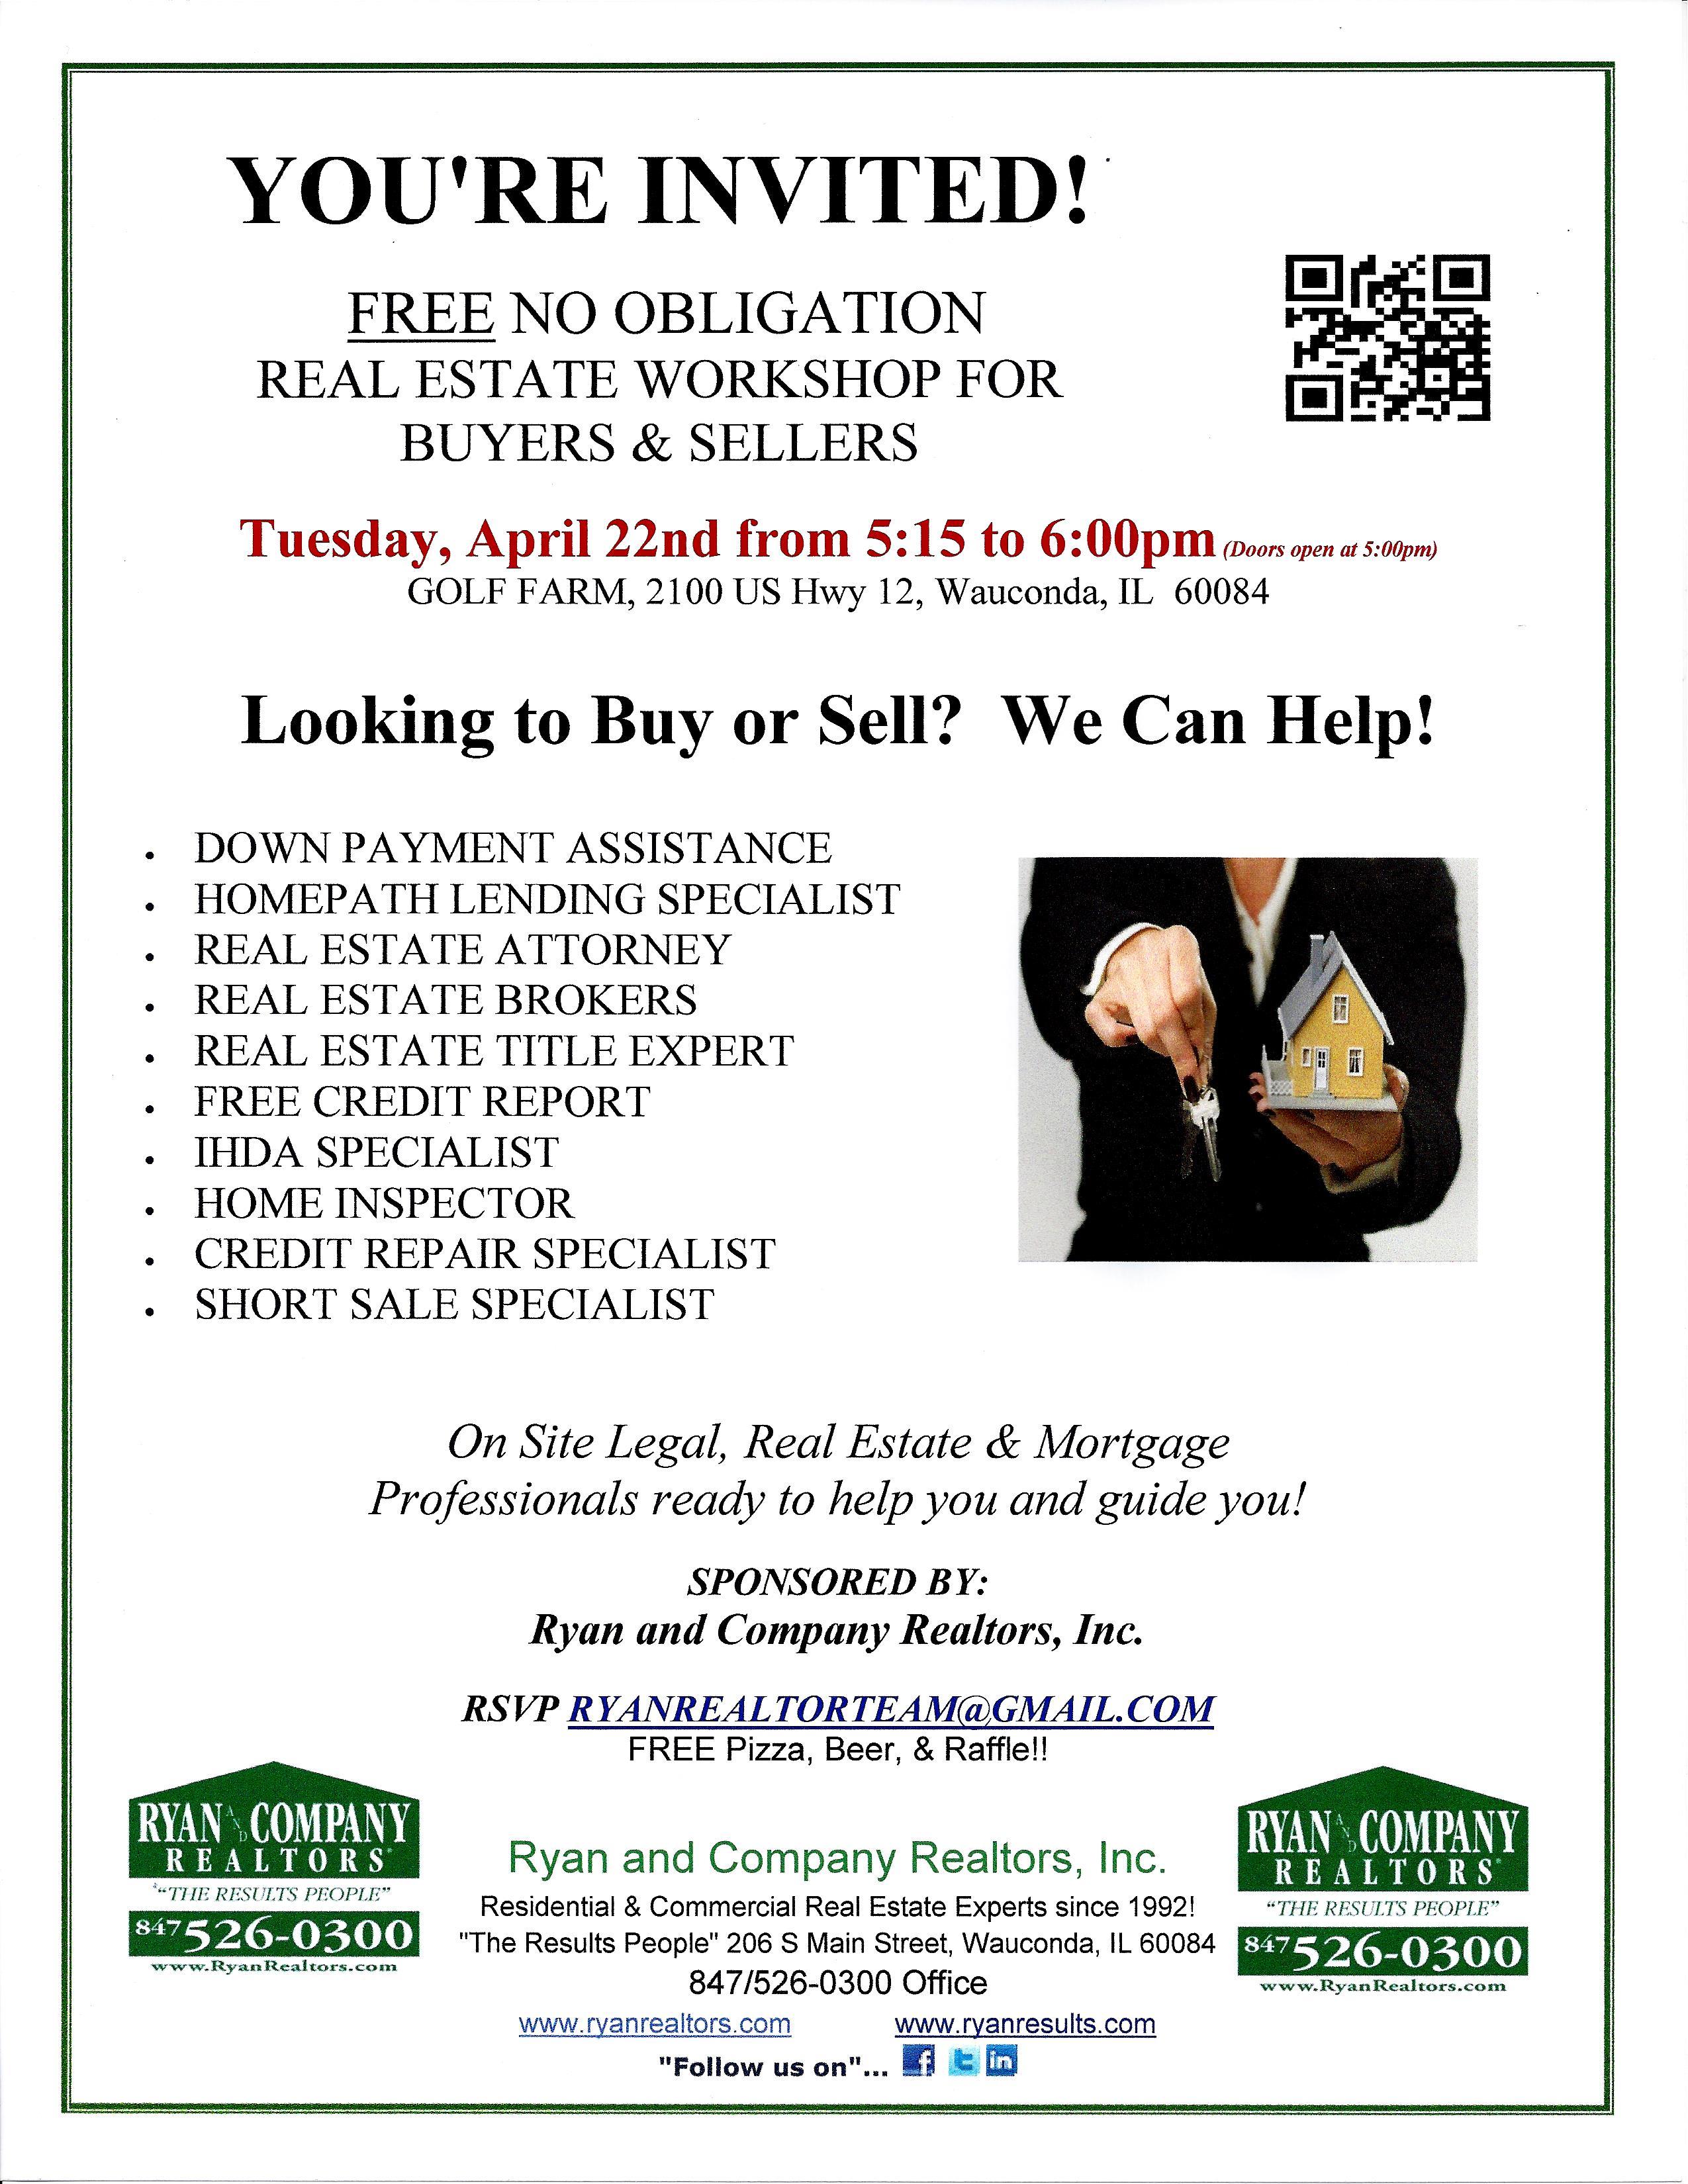 Buyer & Seller Seminar 4-22-14.jpg